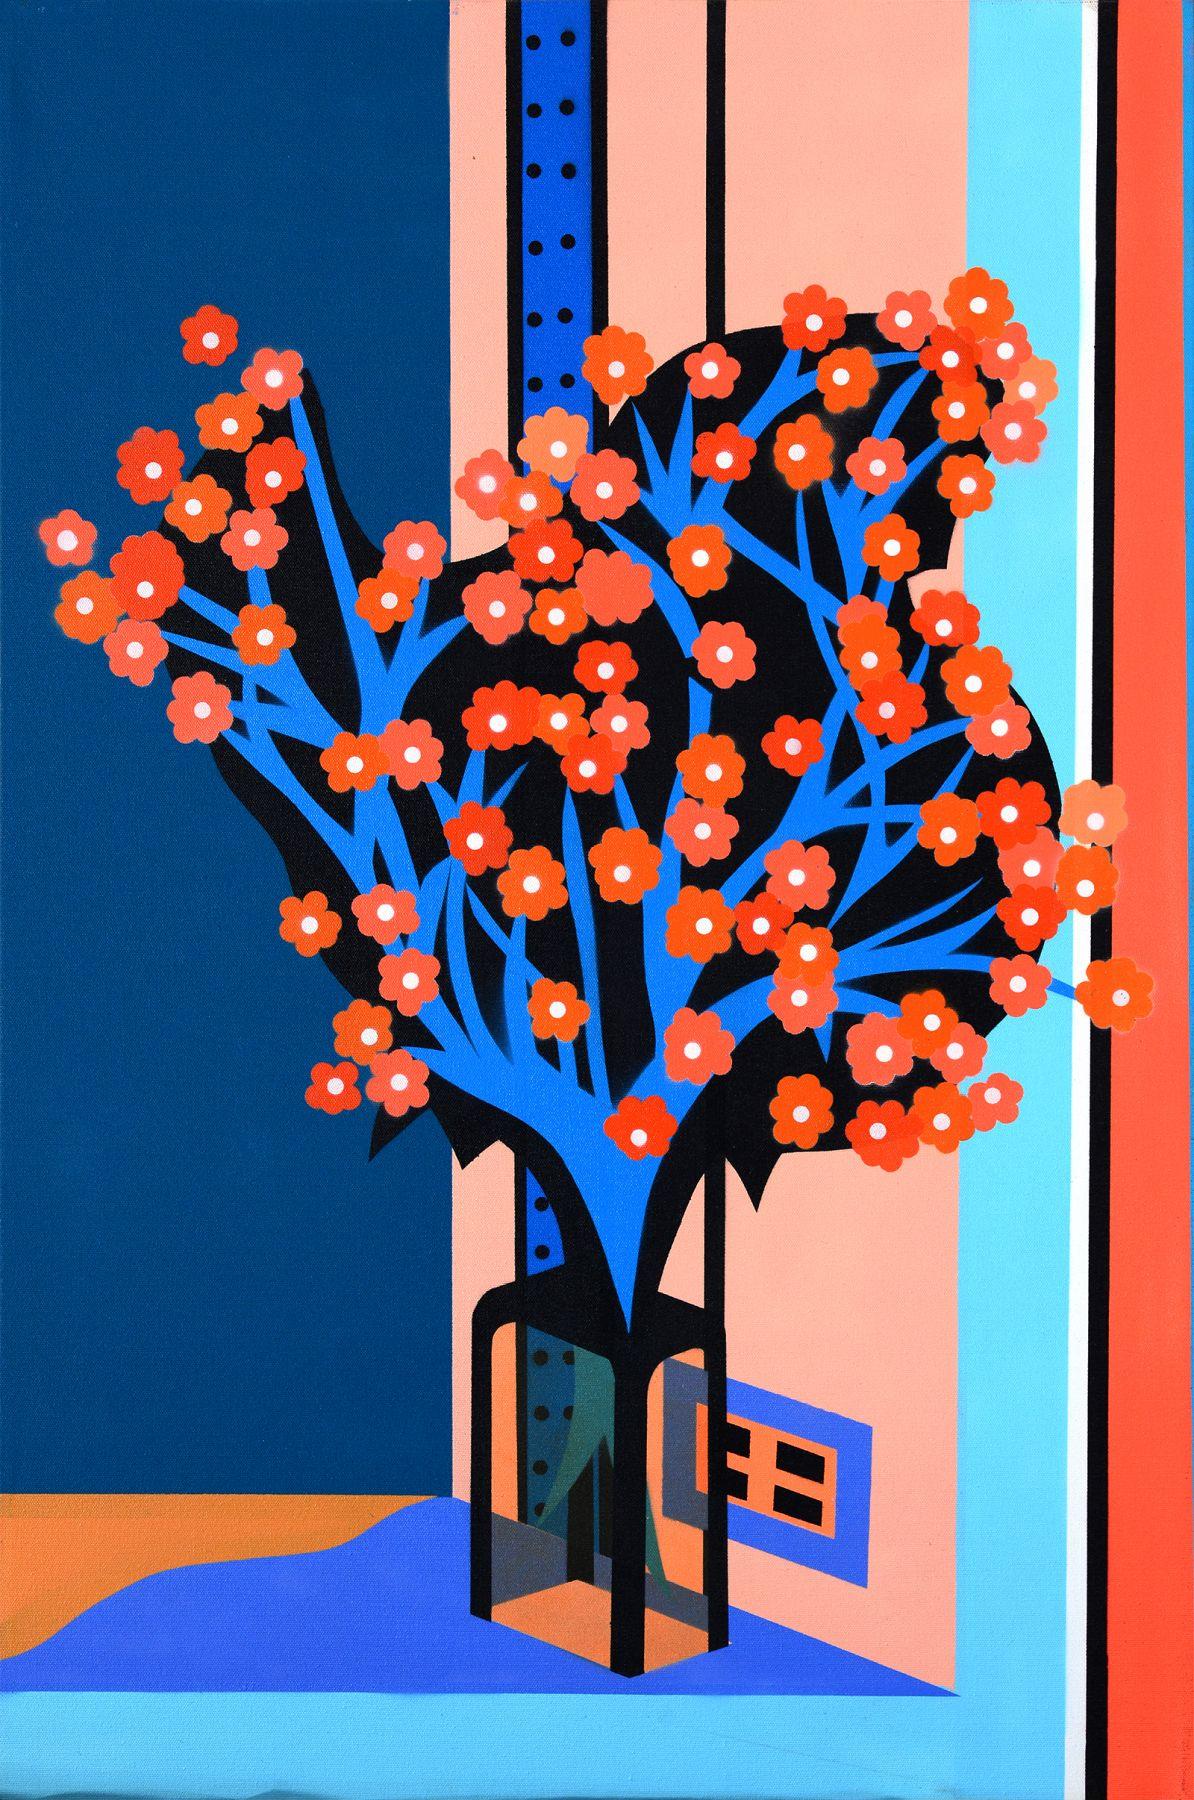 Flower Study by Michael Callas